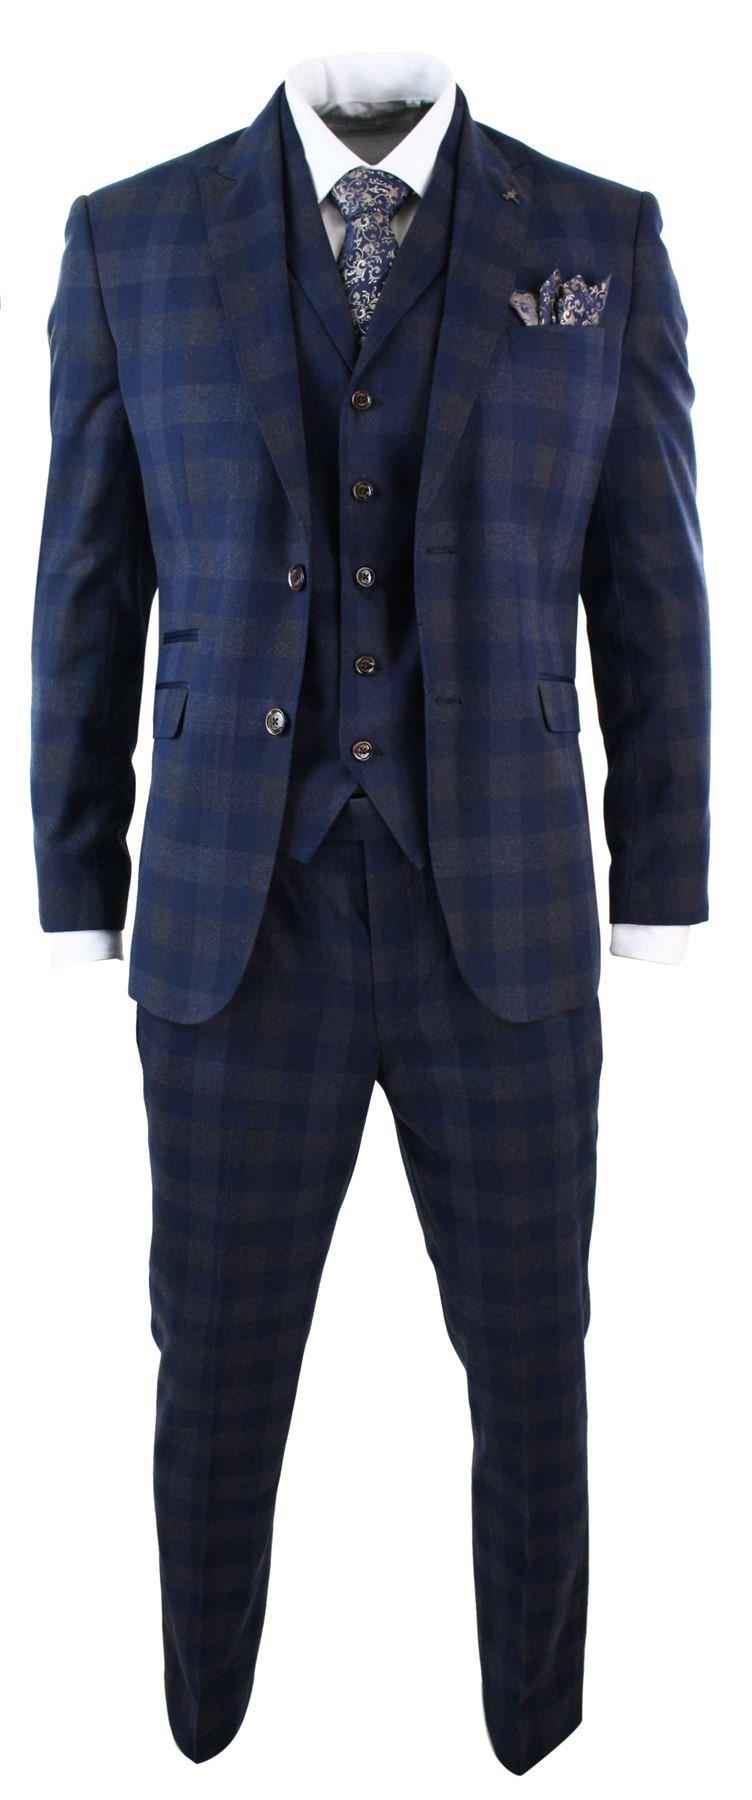 Mens Slim Fit 3 Piece Blue Check Suit Vintage Retro Smart Formal Wedding Party Prom